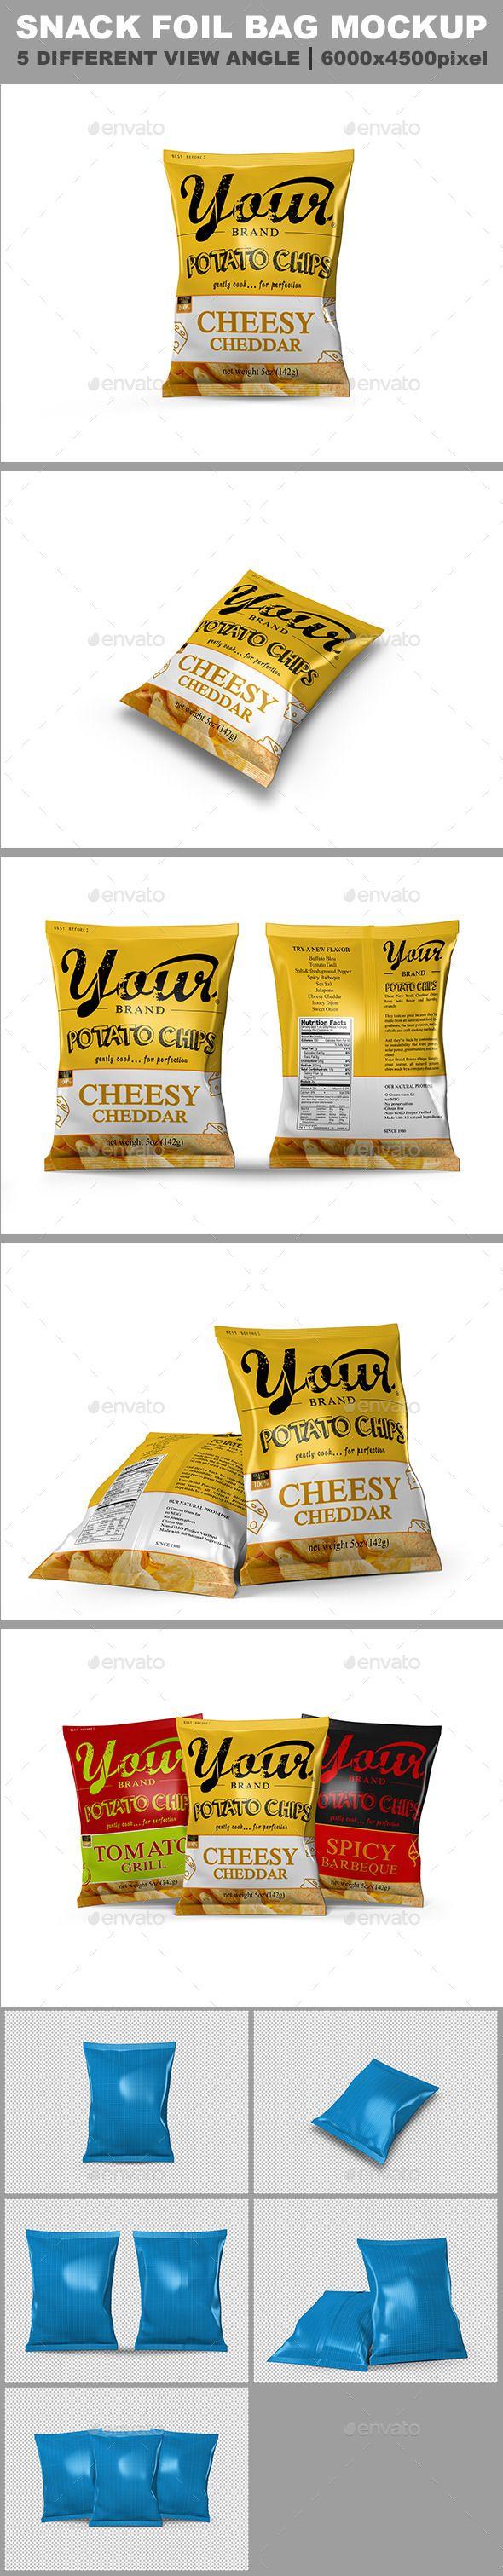 Download 5 Snack Bag Mockup Bag Mockup Snack Bags Snack Box Packaging